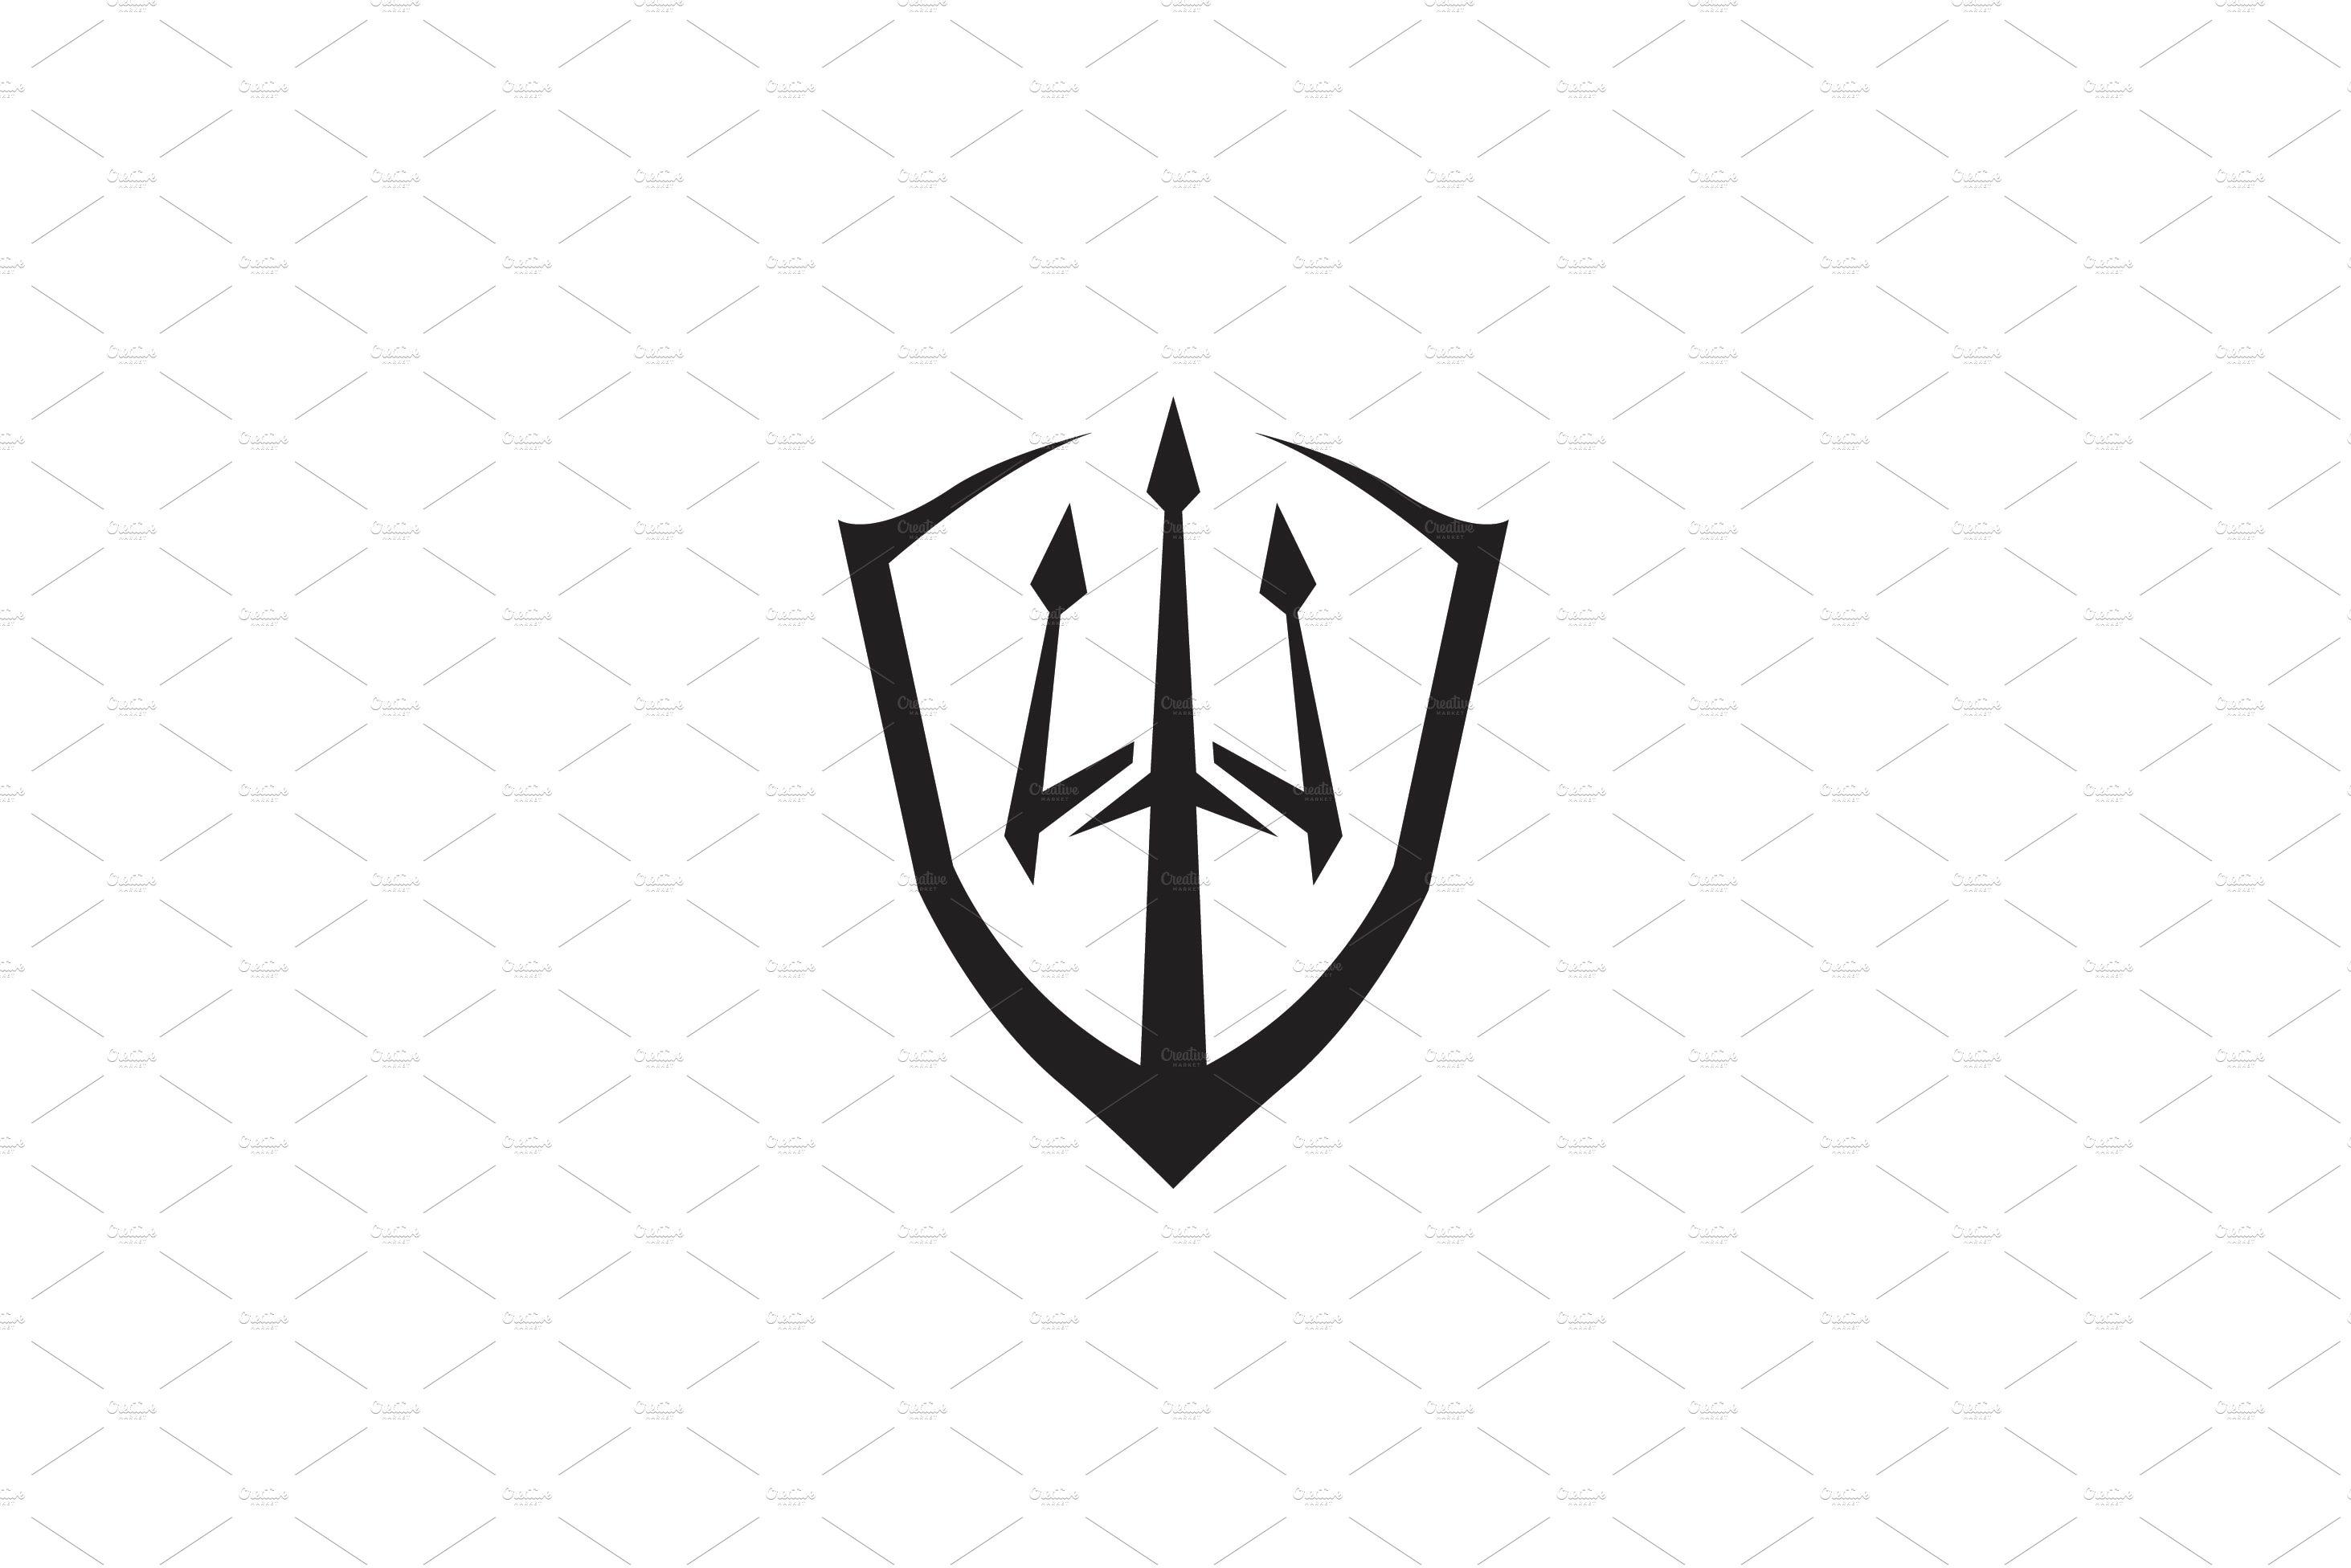 Trident spear shield logo design.